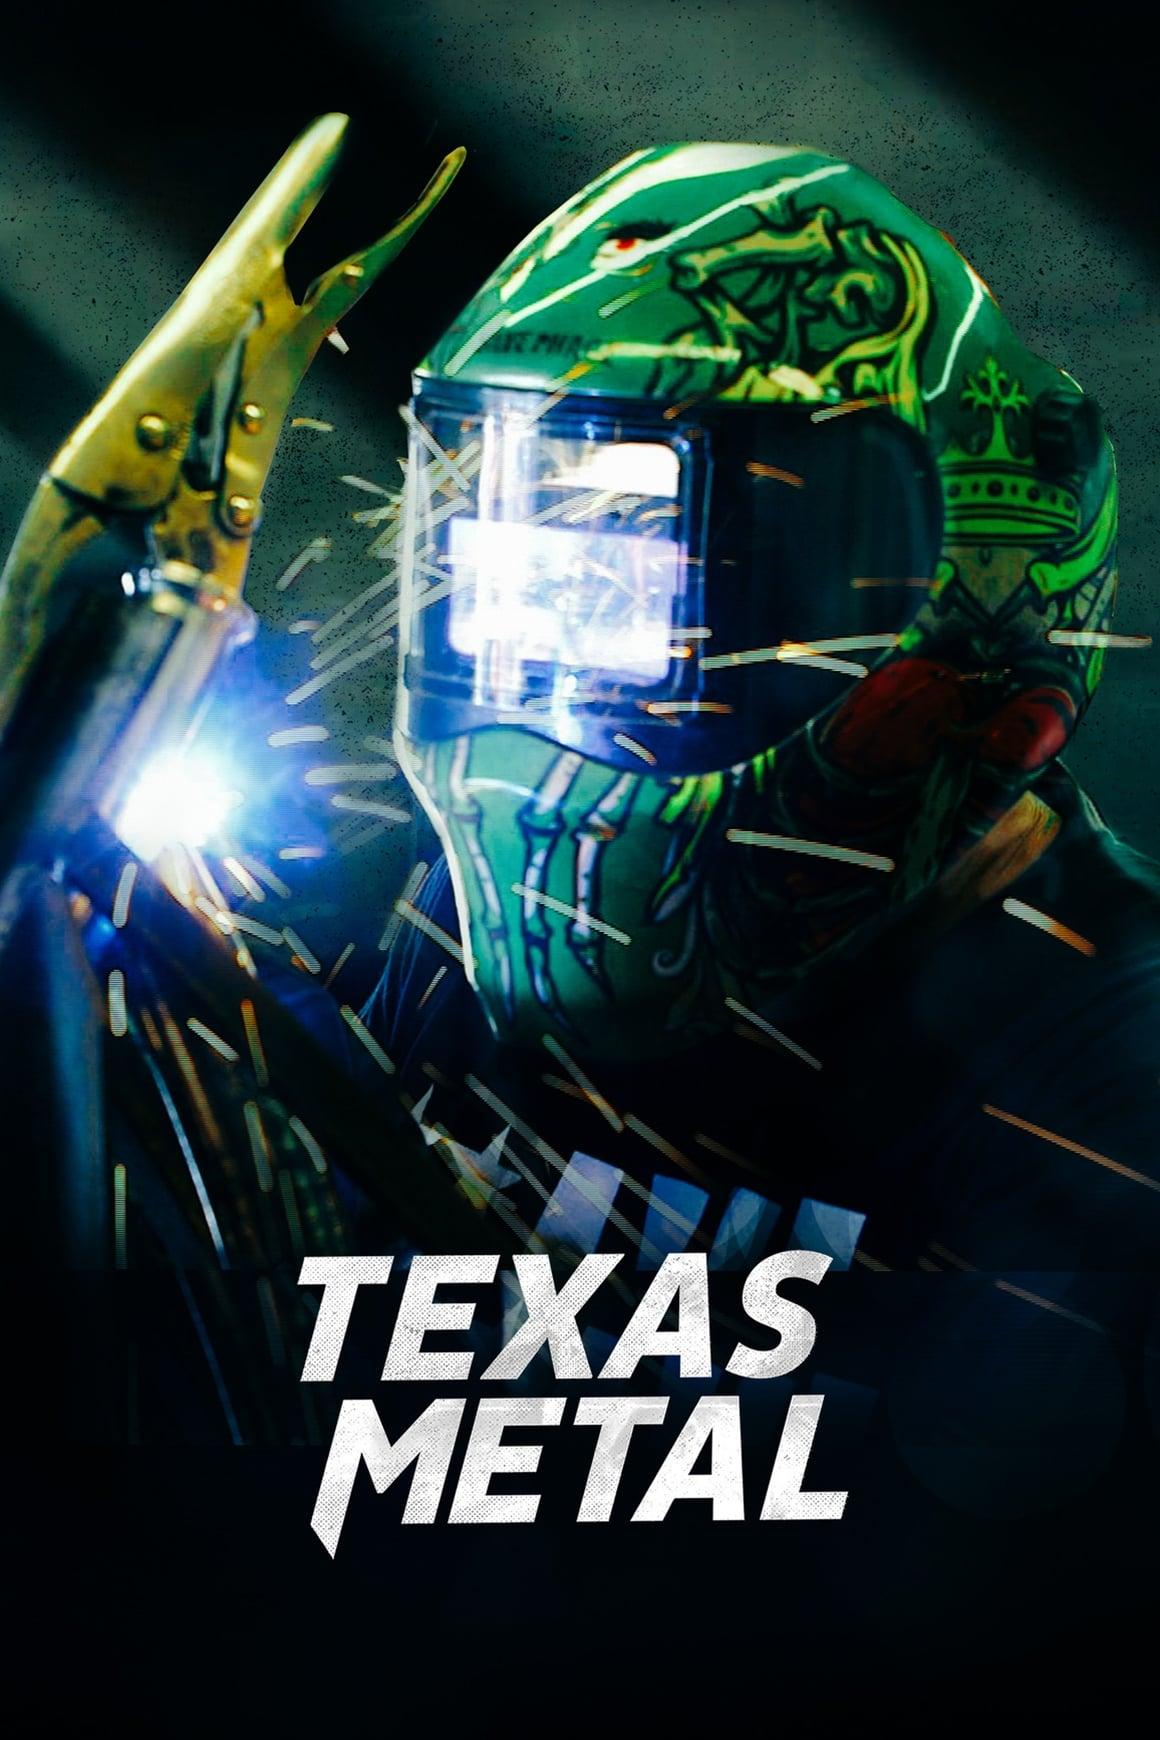 Texas Metal (2017)